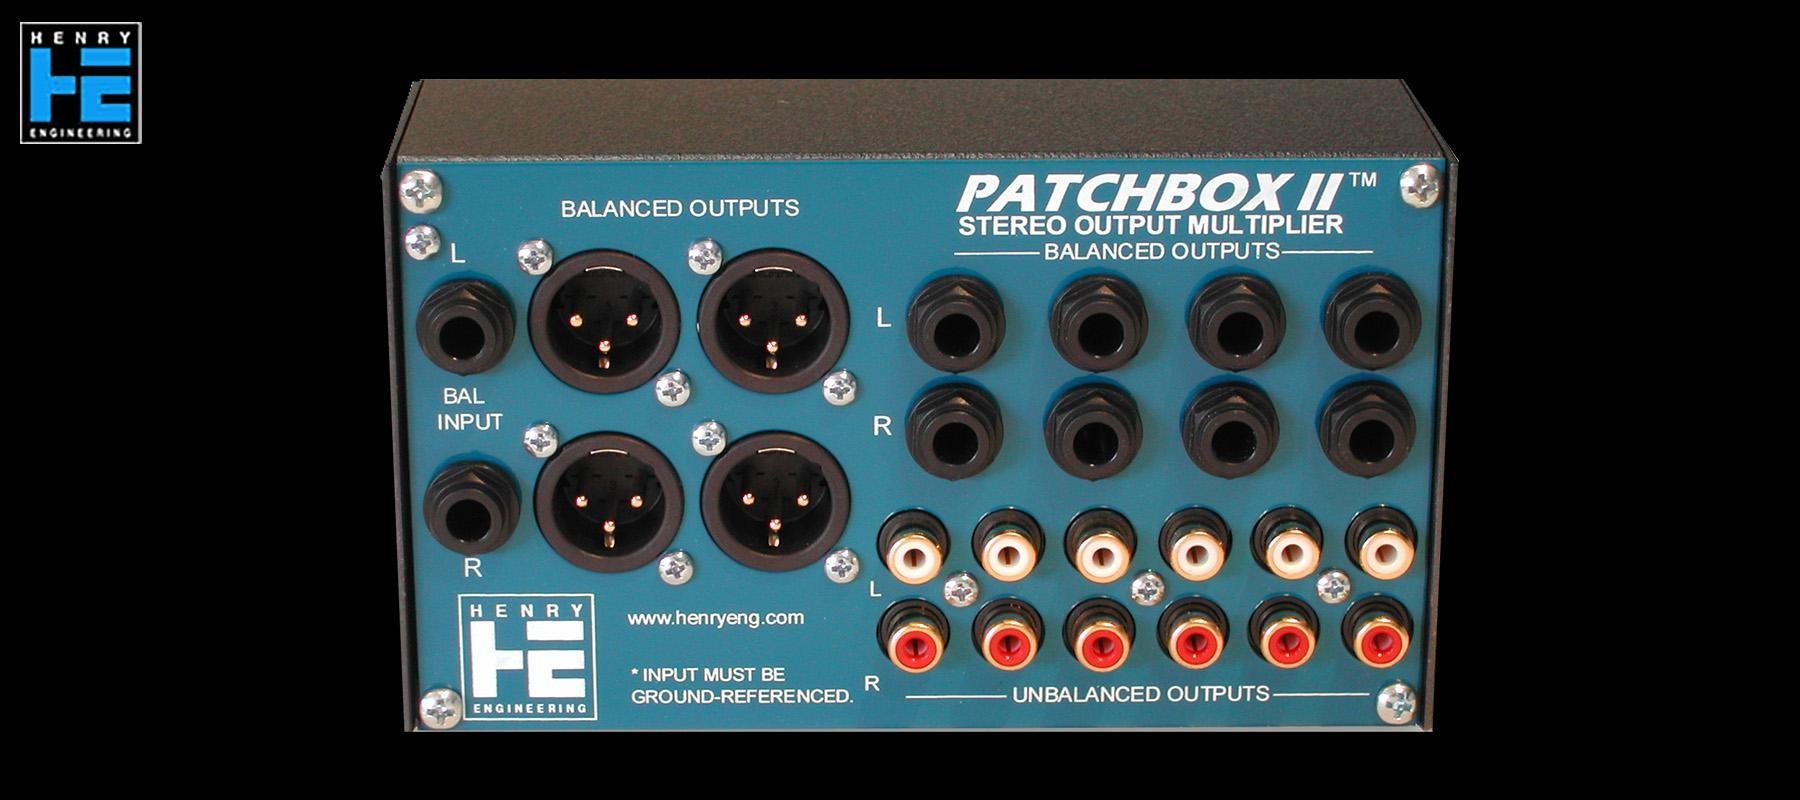 Henry Engineering Patchbox II